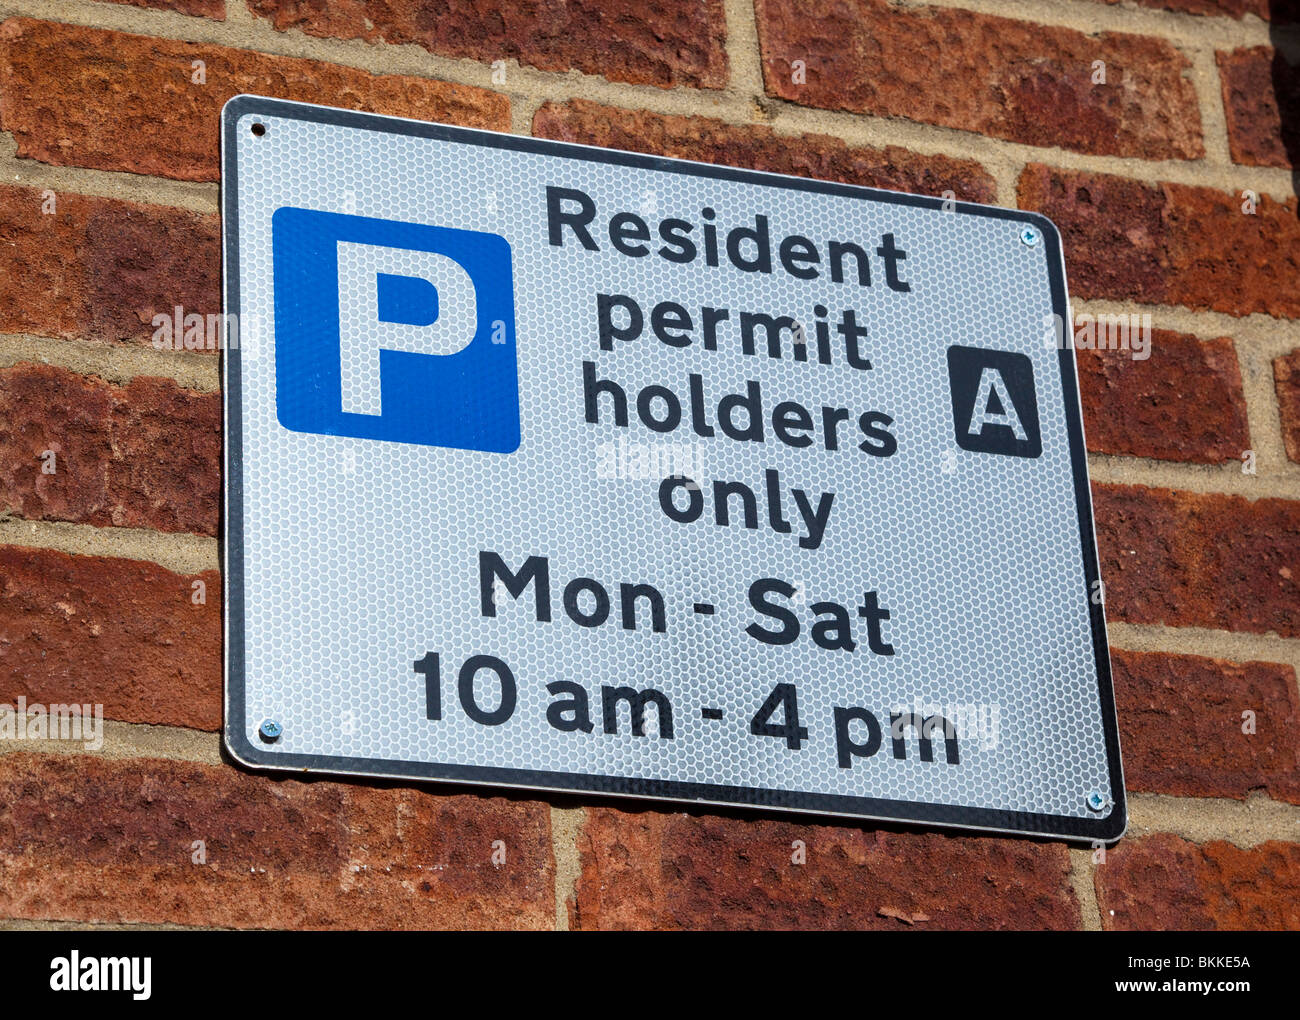 residents parking sign UK - Stock Image